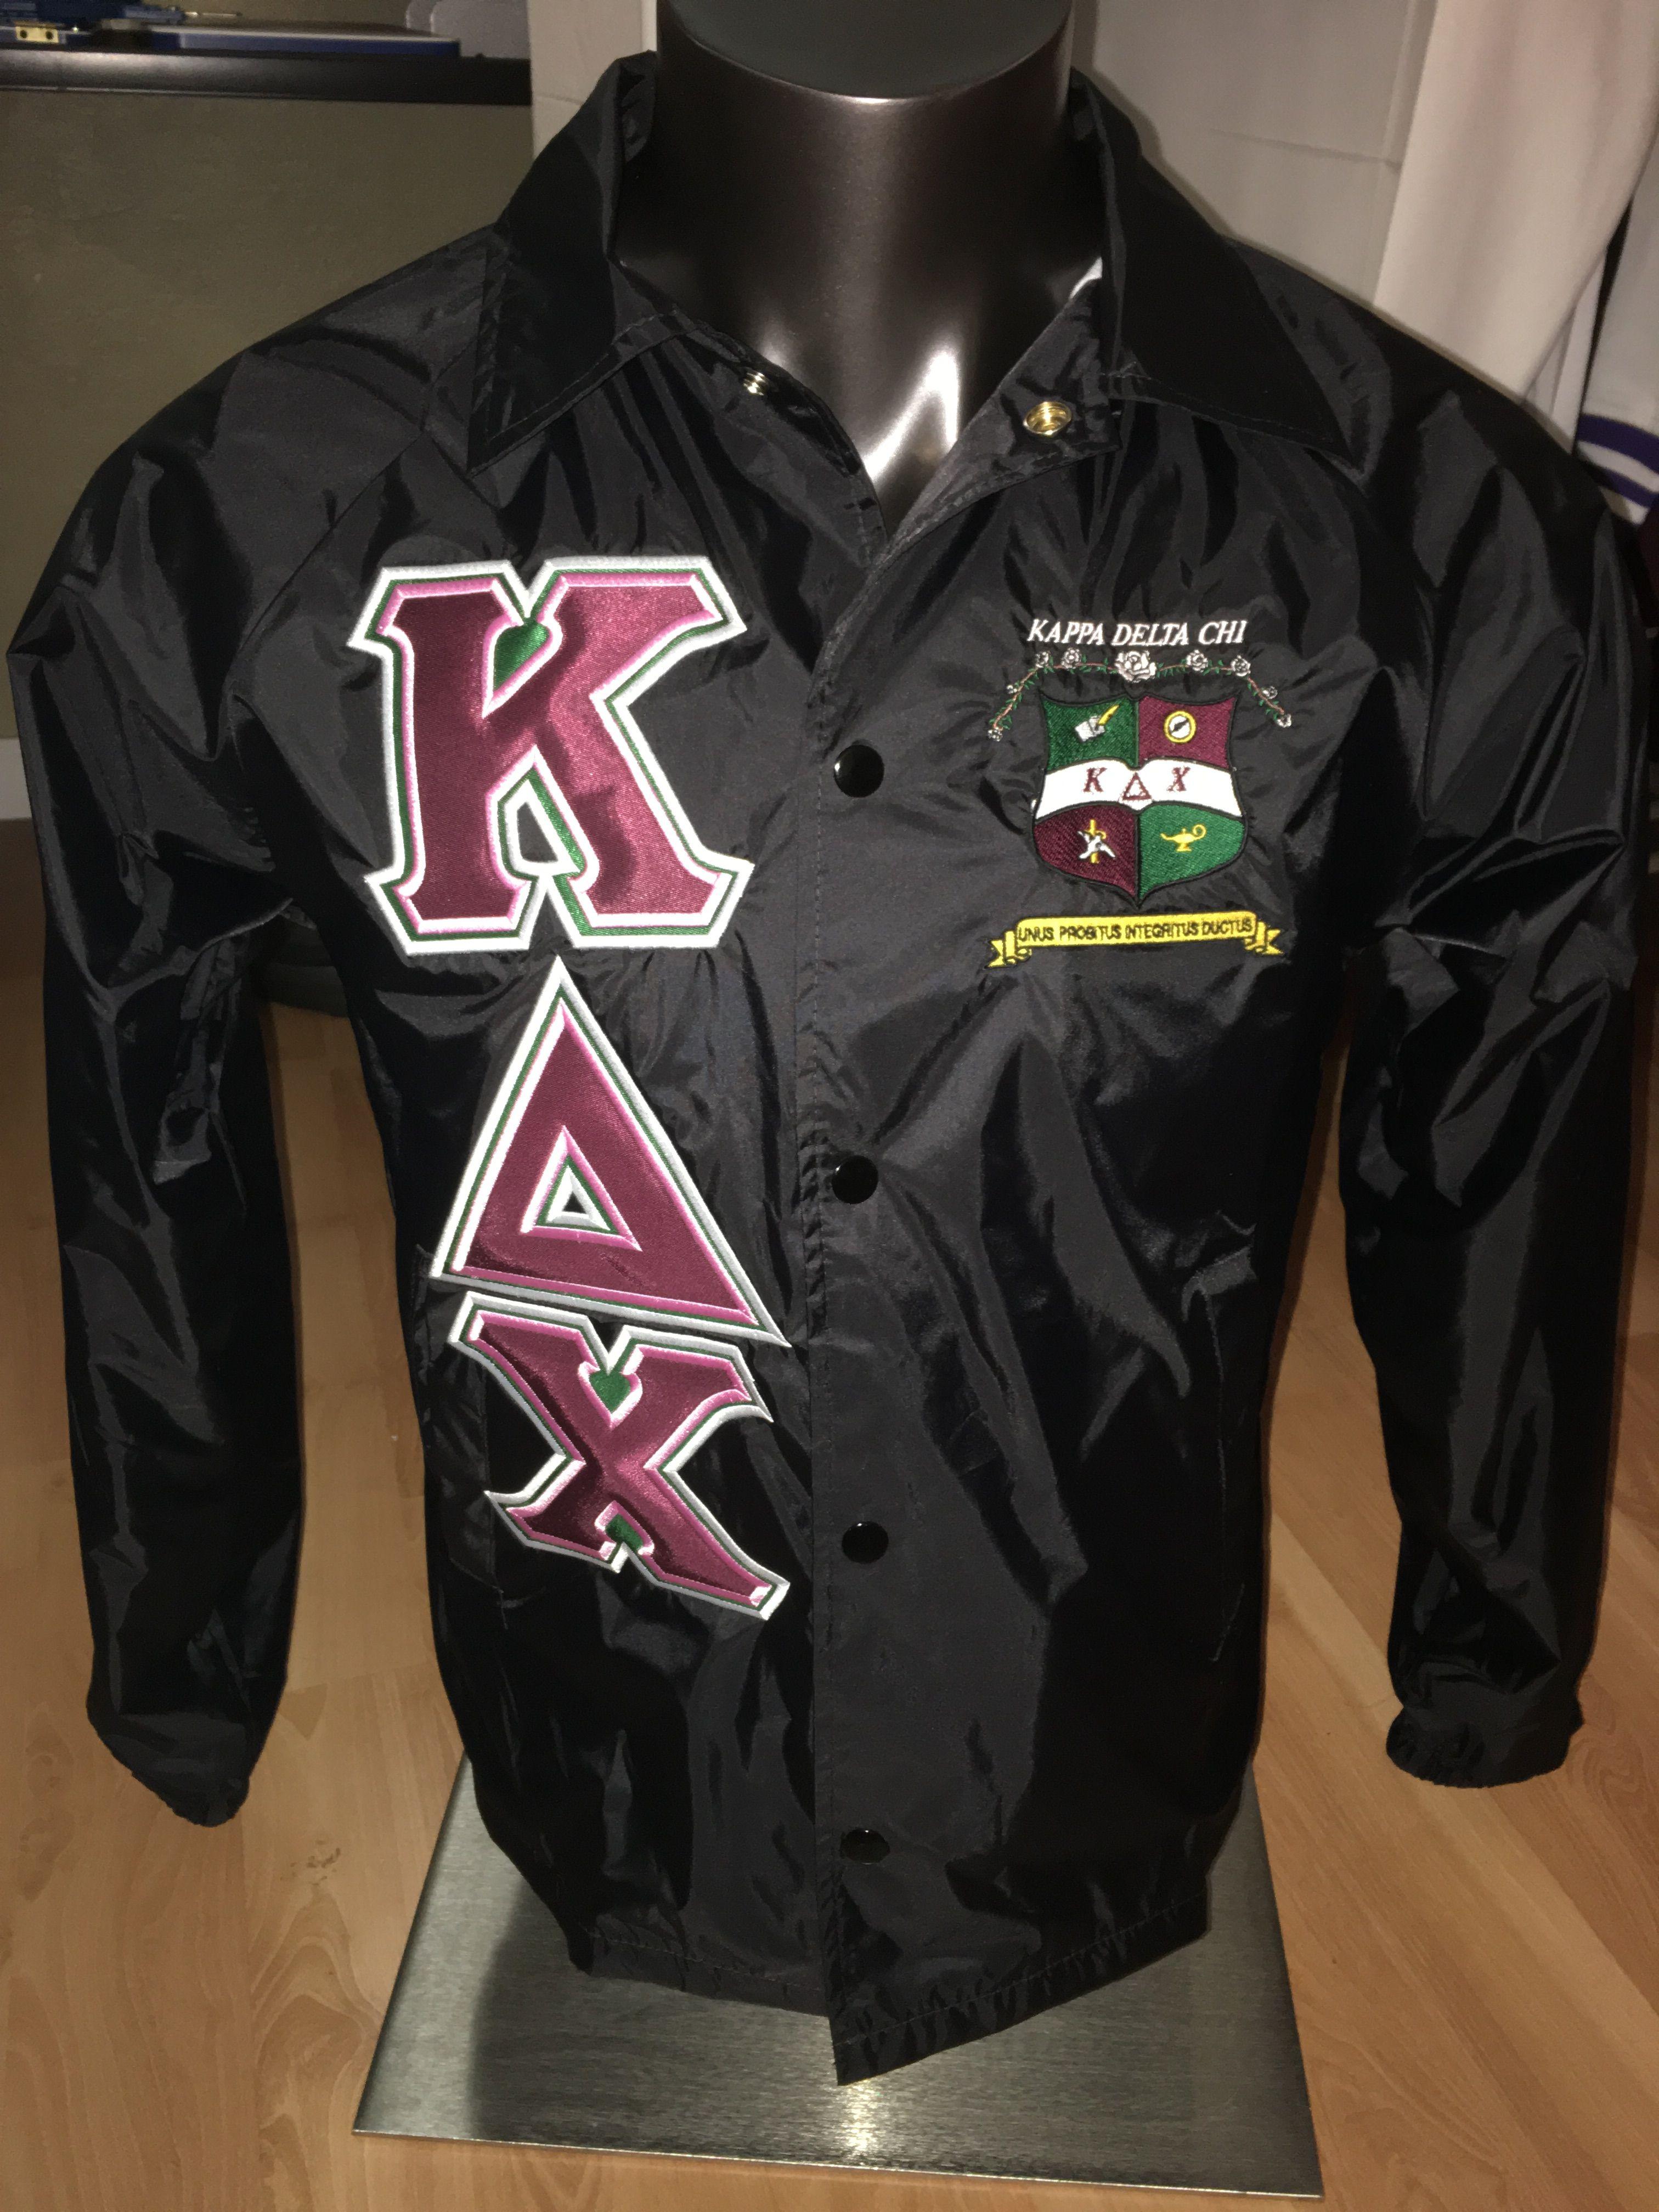 ae84ad4271 Kappa Delta Chi Line Jacket | Kappa Delta Chi | Kappa delta chi ...